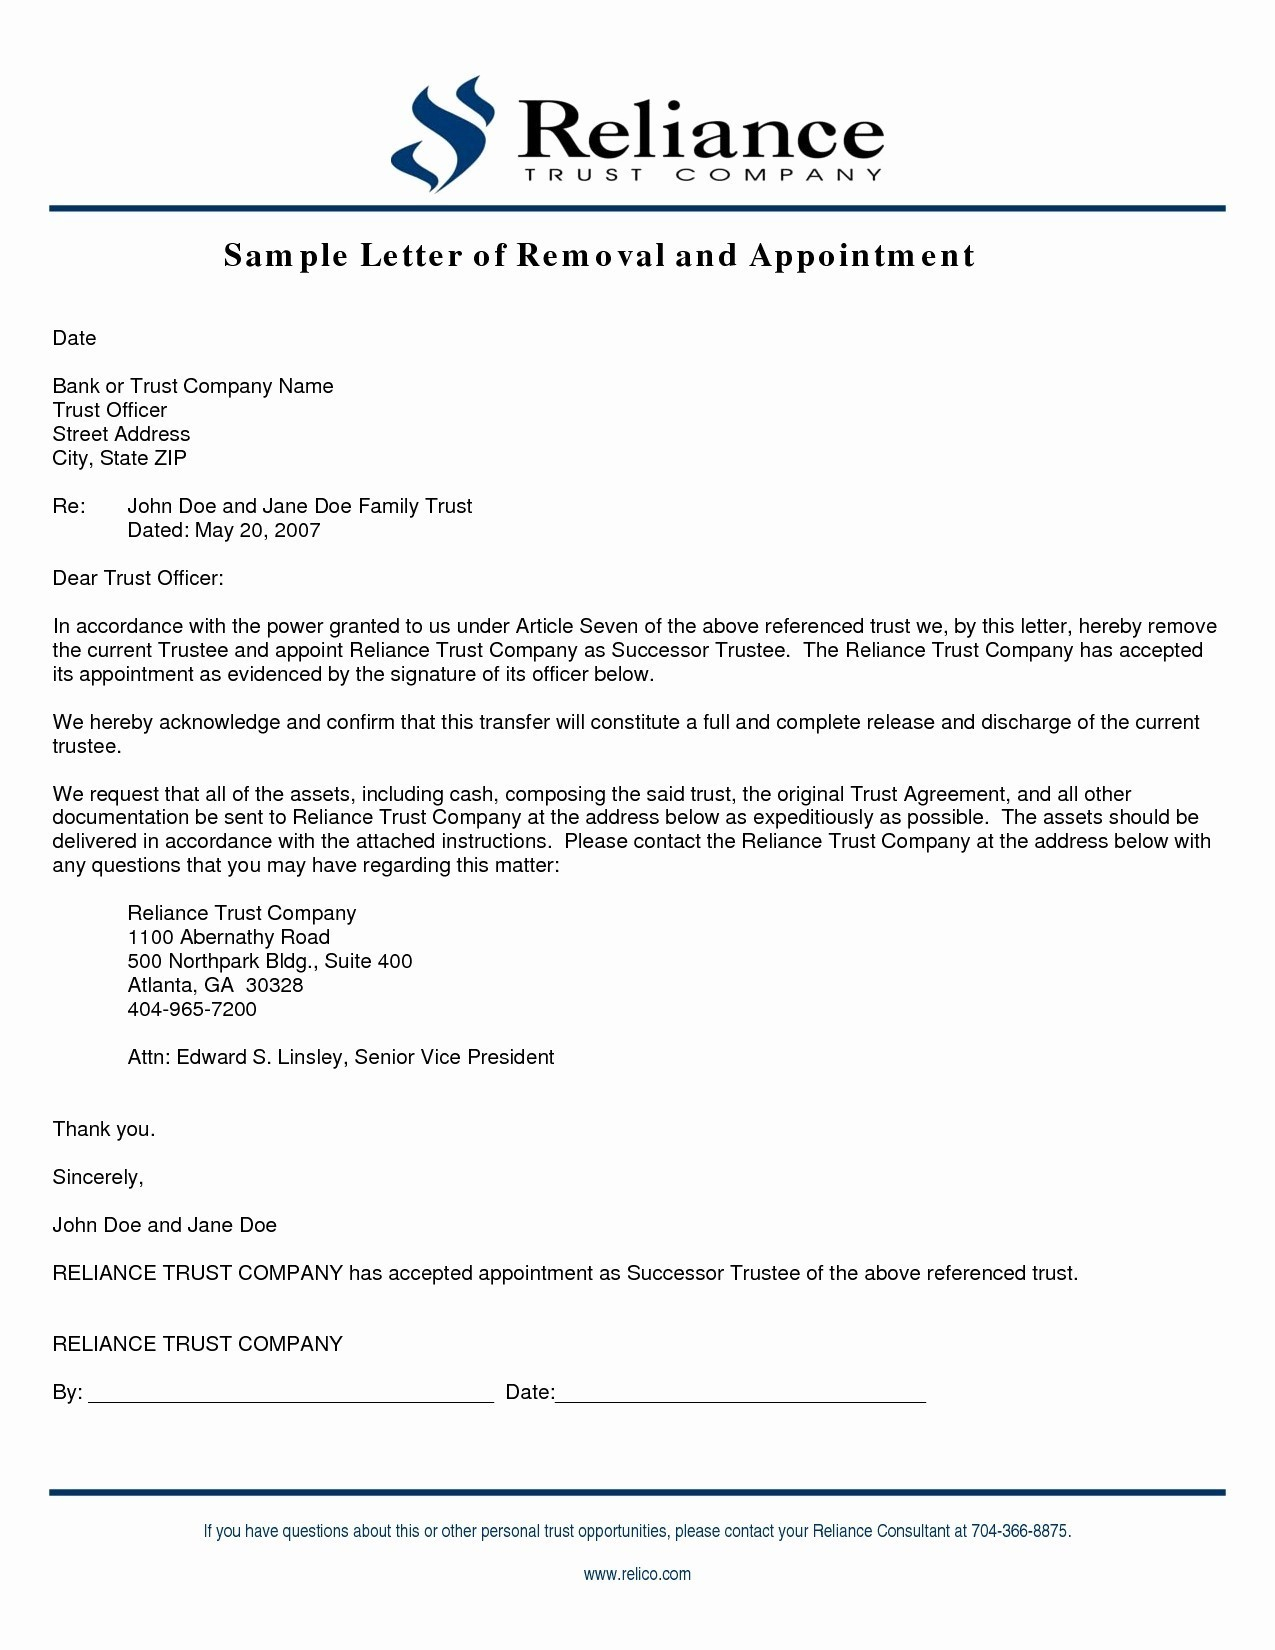 Job Offer Letter Template Pdf - Cpt Job Fer Letter Sample Inspirationa Job Fer Letter Template Pdf